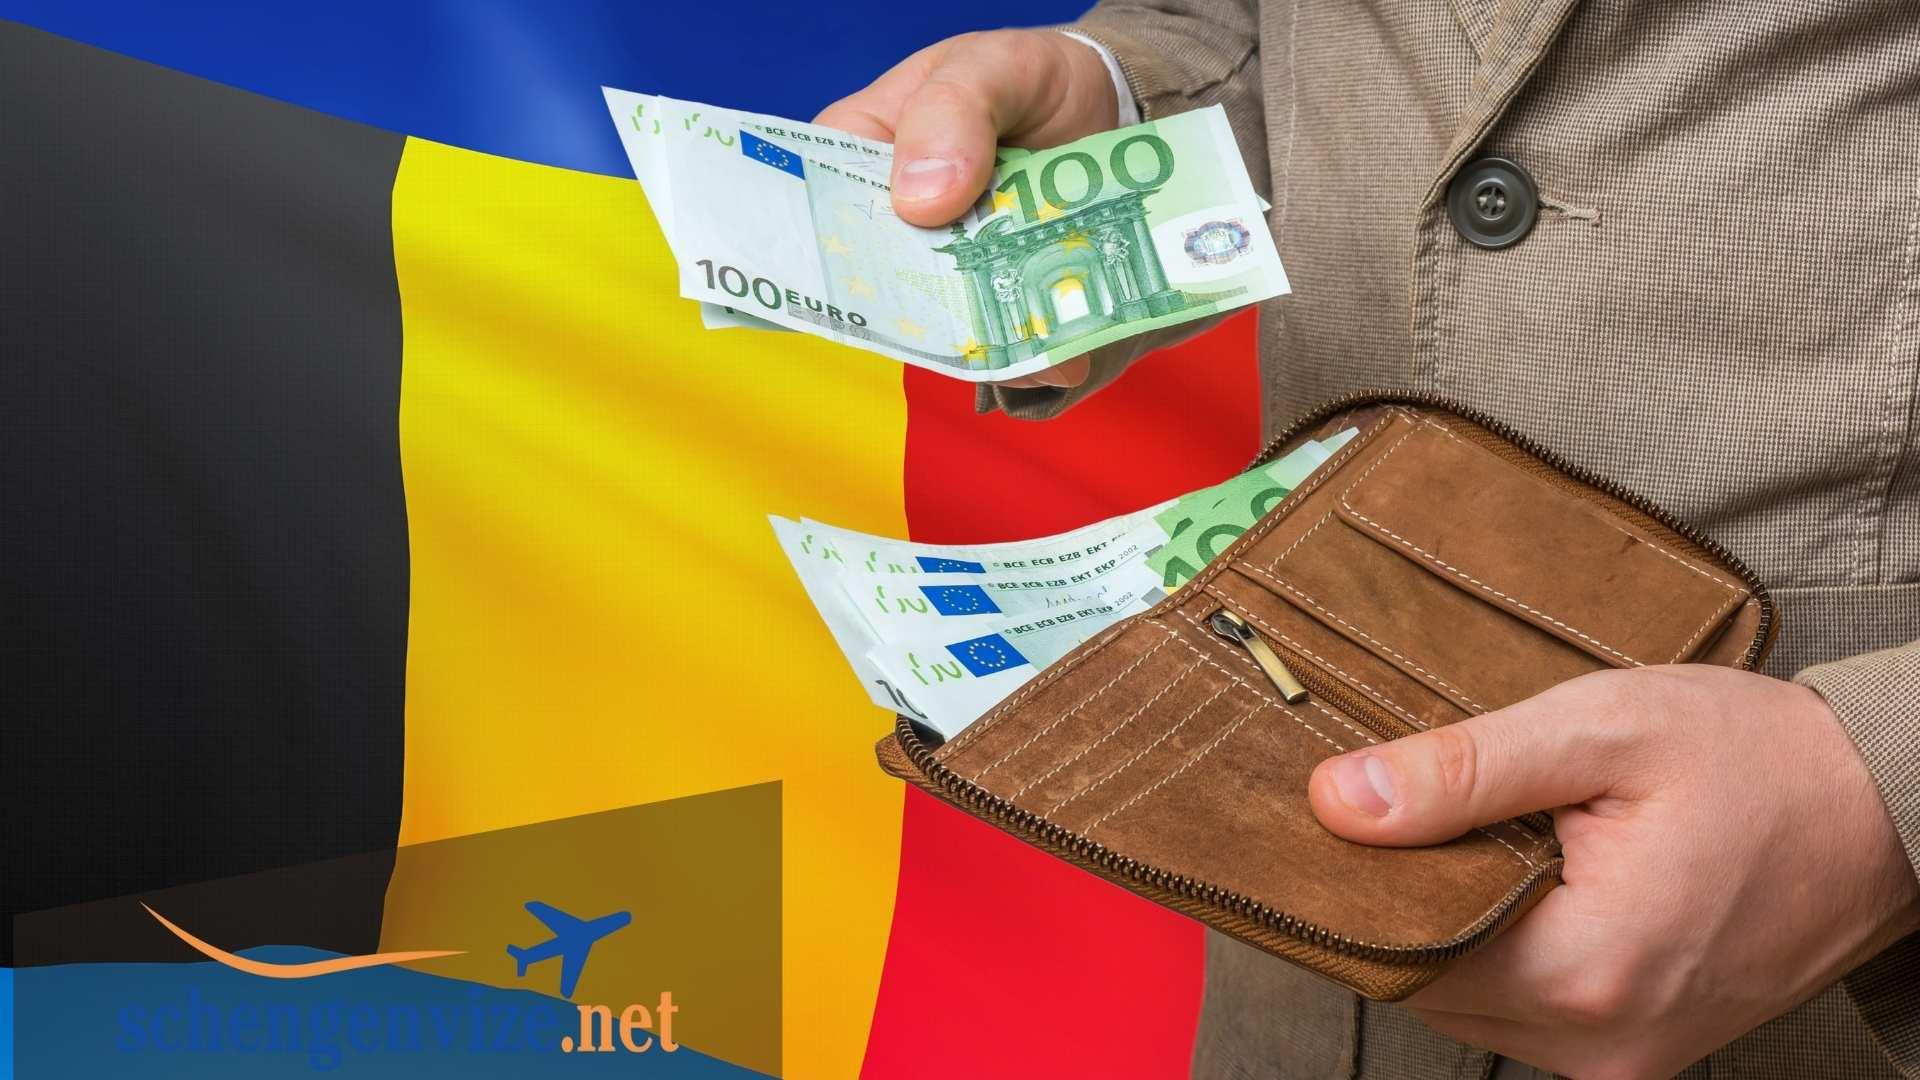 Belçika Vize Ücreti